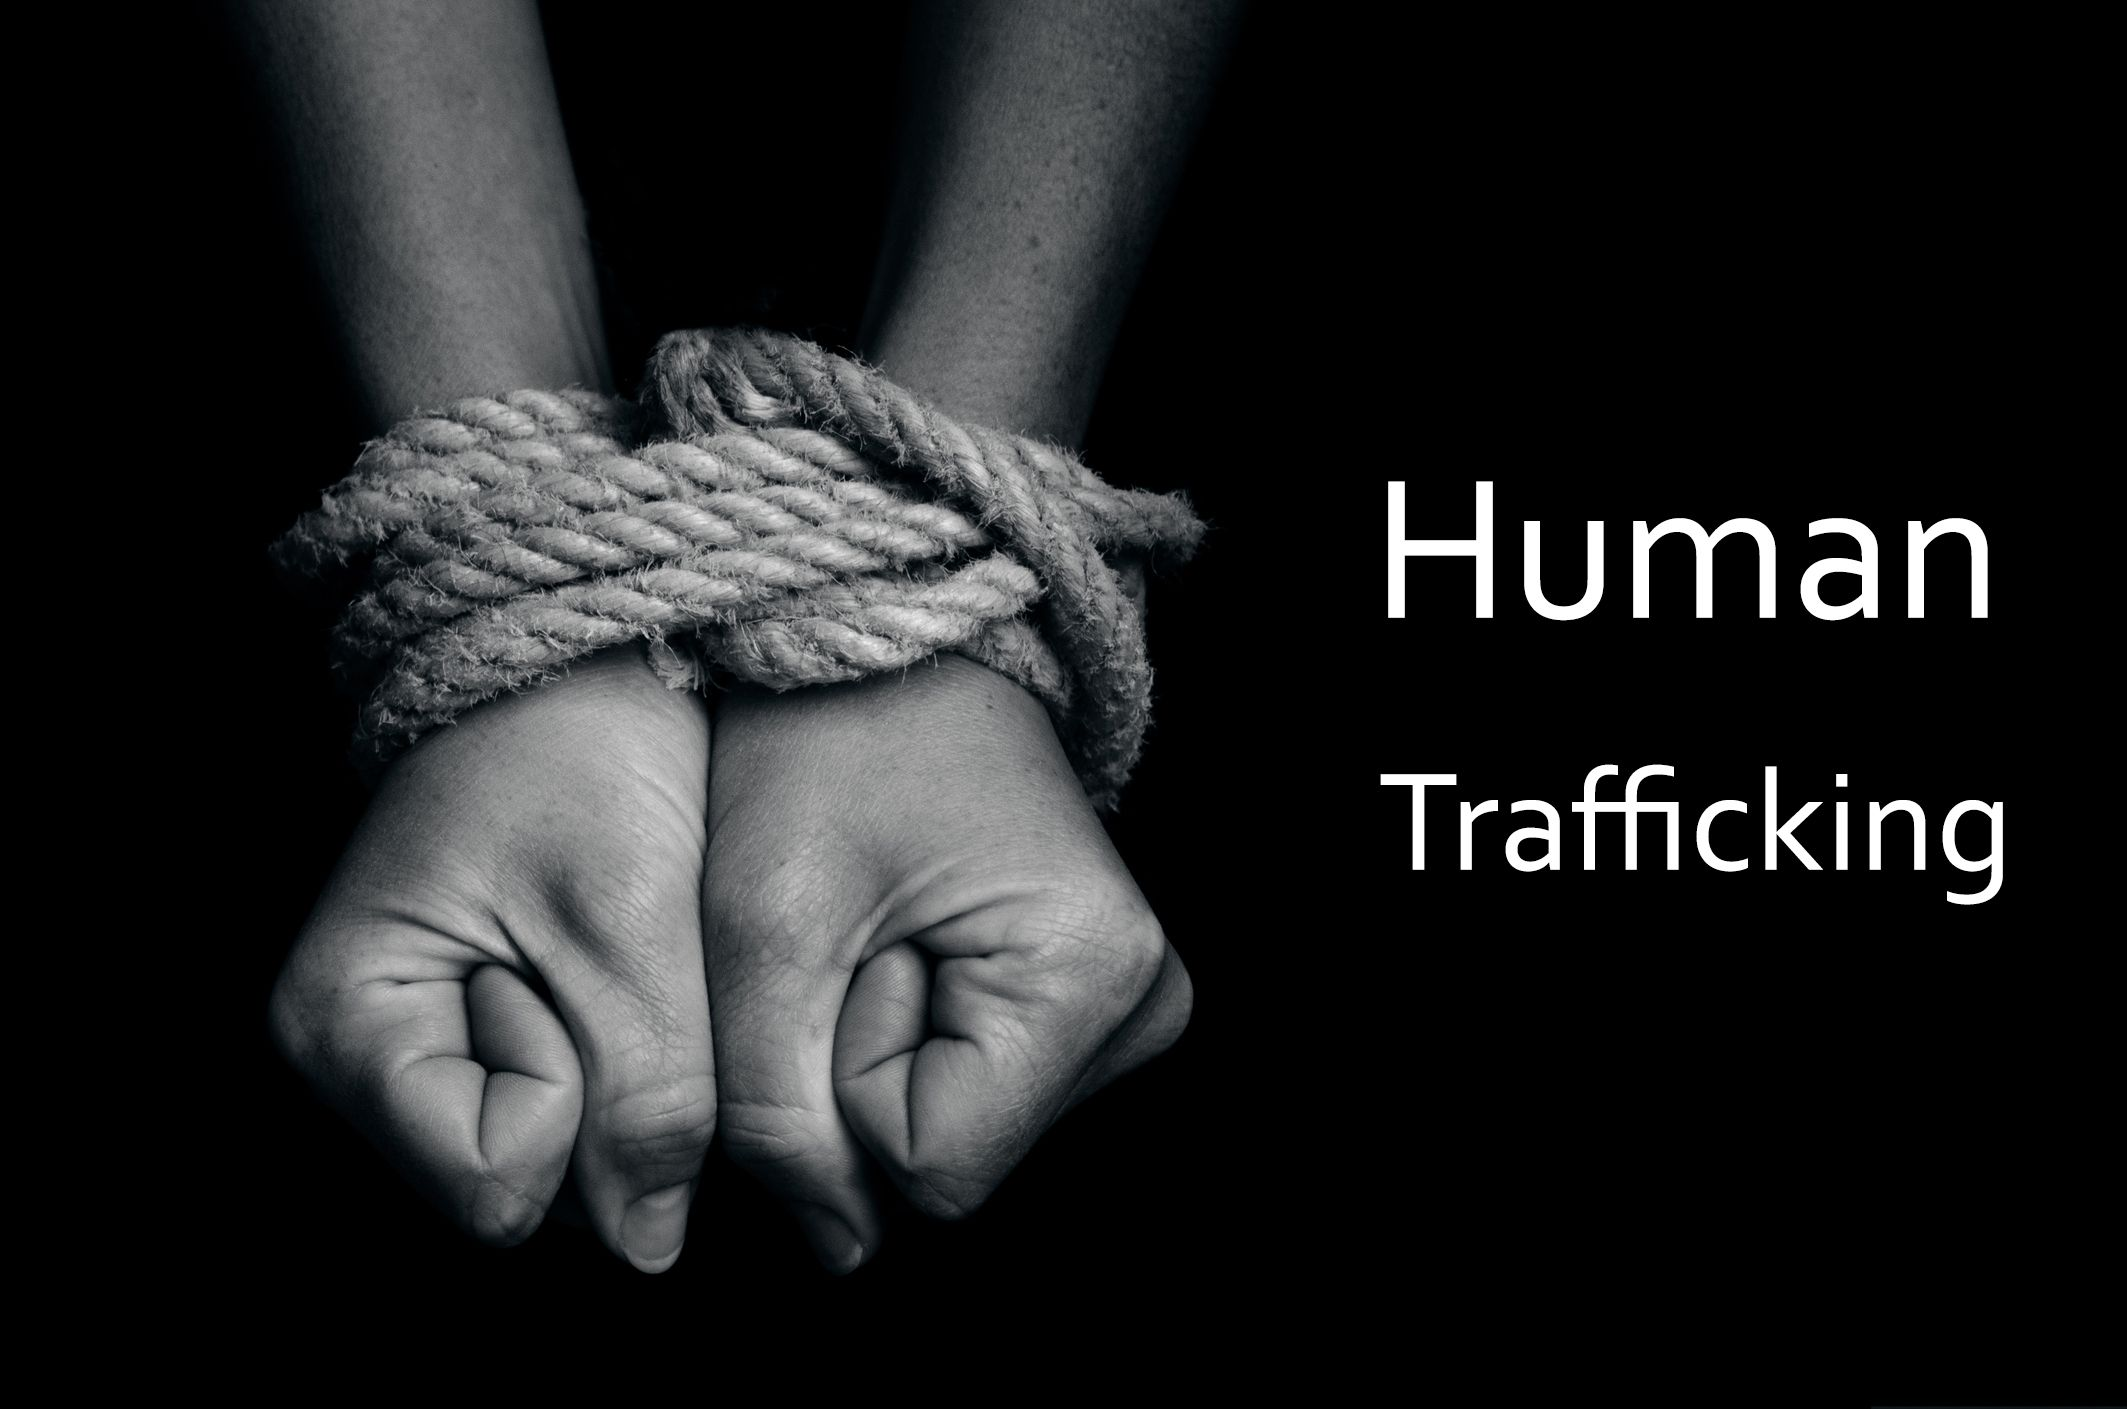 India's Anti-Trafficking Efforts Still Need Improvement || #humantrafficking #humanrights #womanjustice